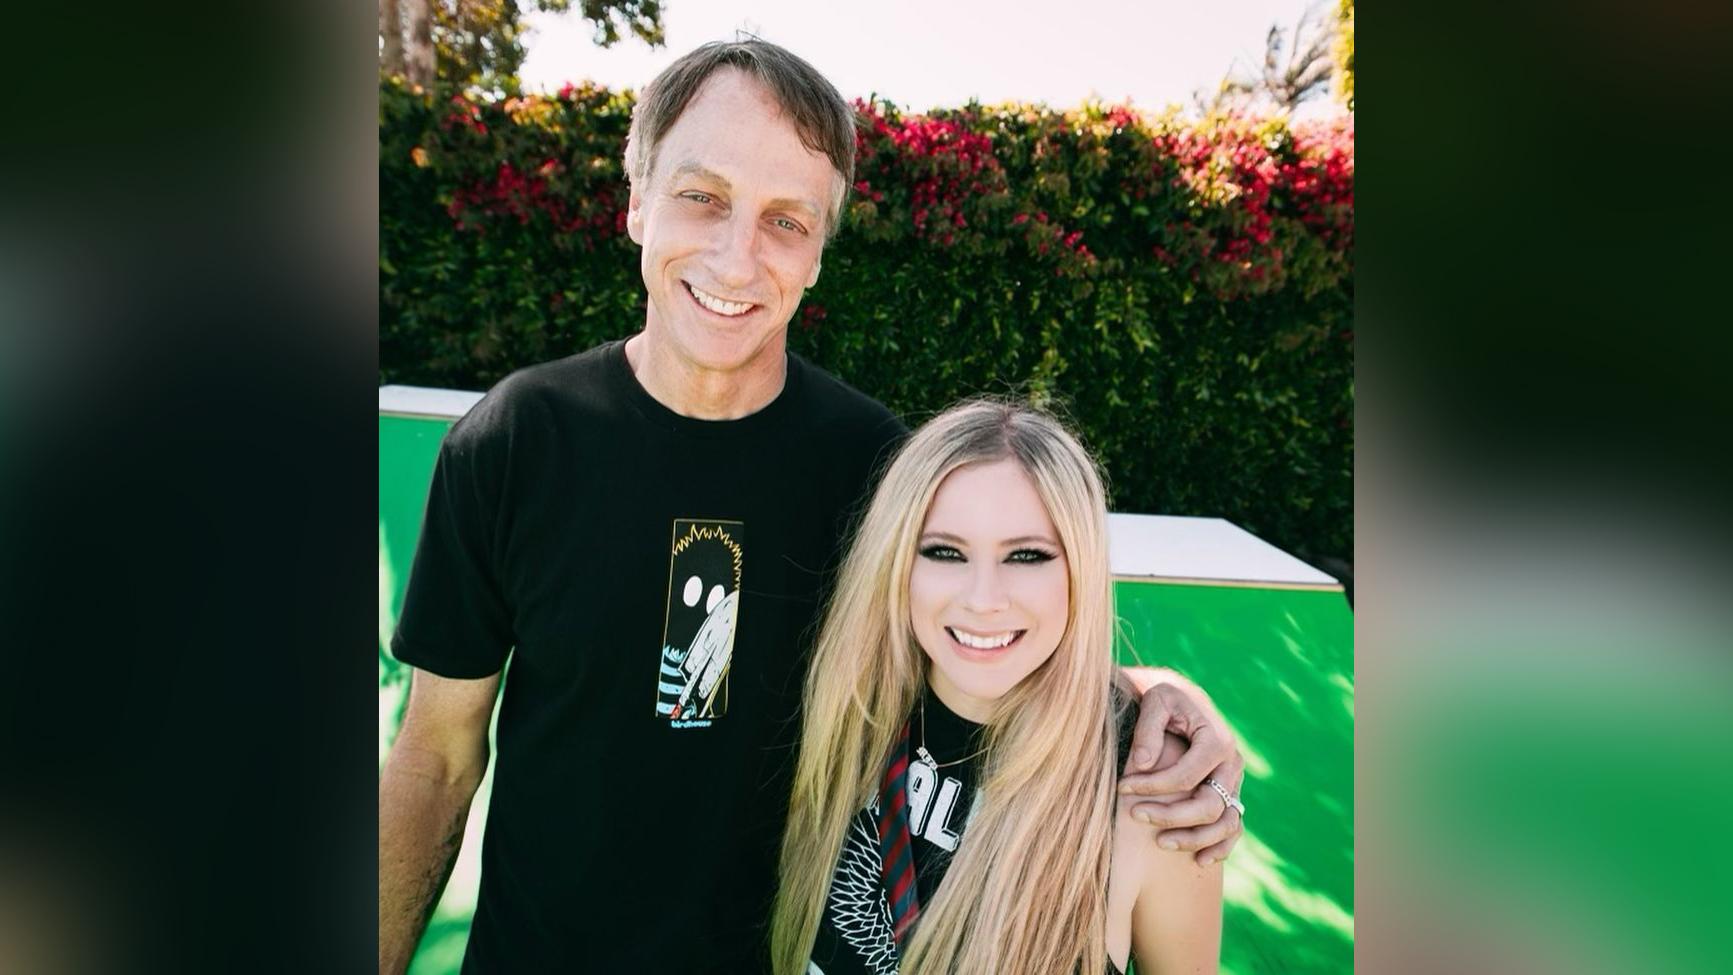 Avril Lavigne partners with real-life 'Sk8er boi' Tony Hawk in TikTok debut